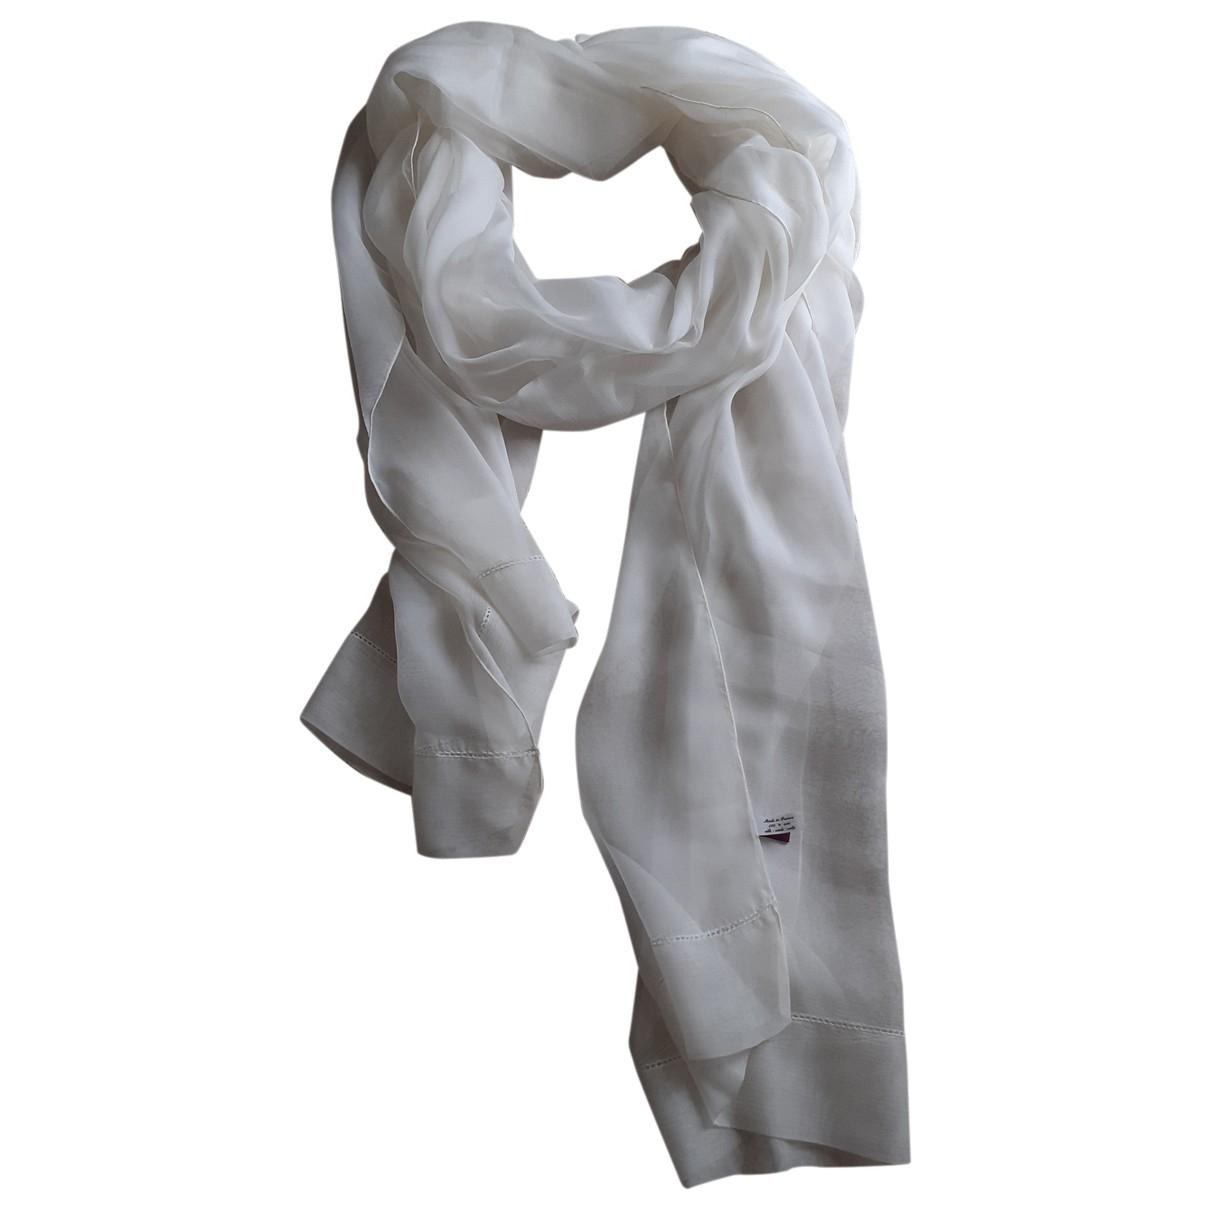 Talbot Runhof - Foulard   pour femme en soie - ecru